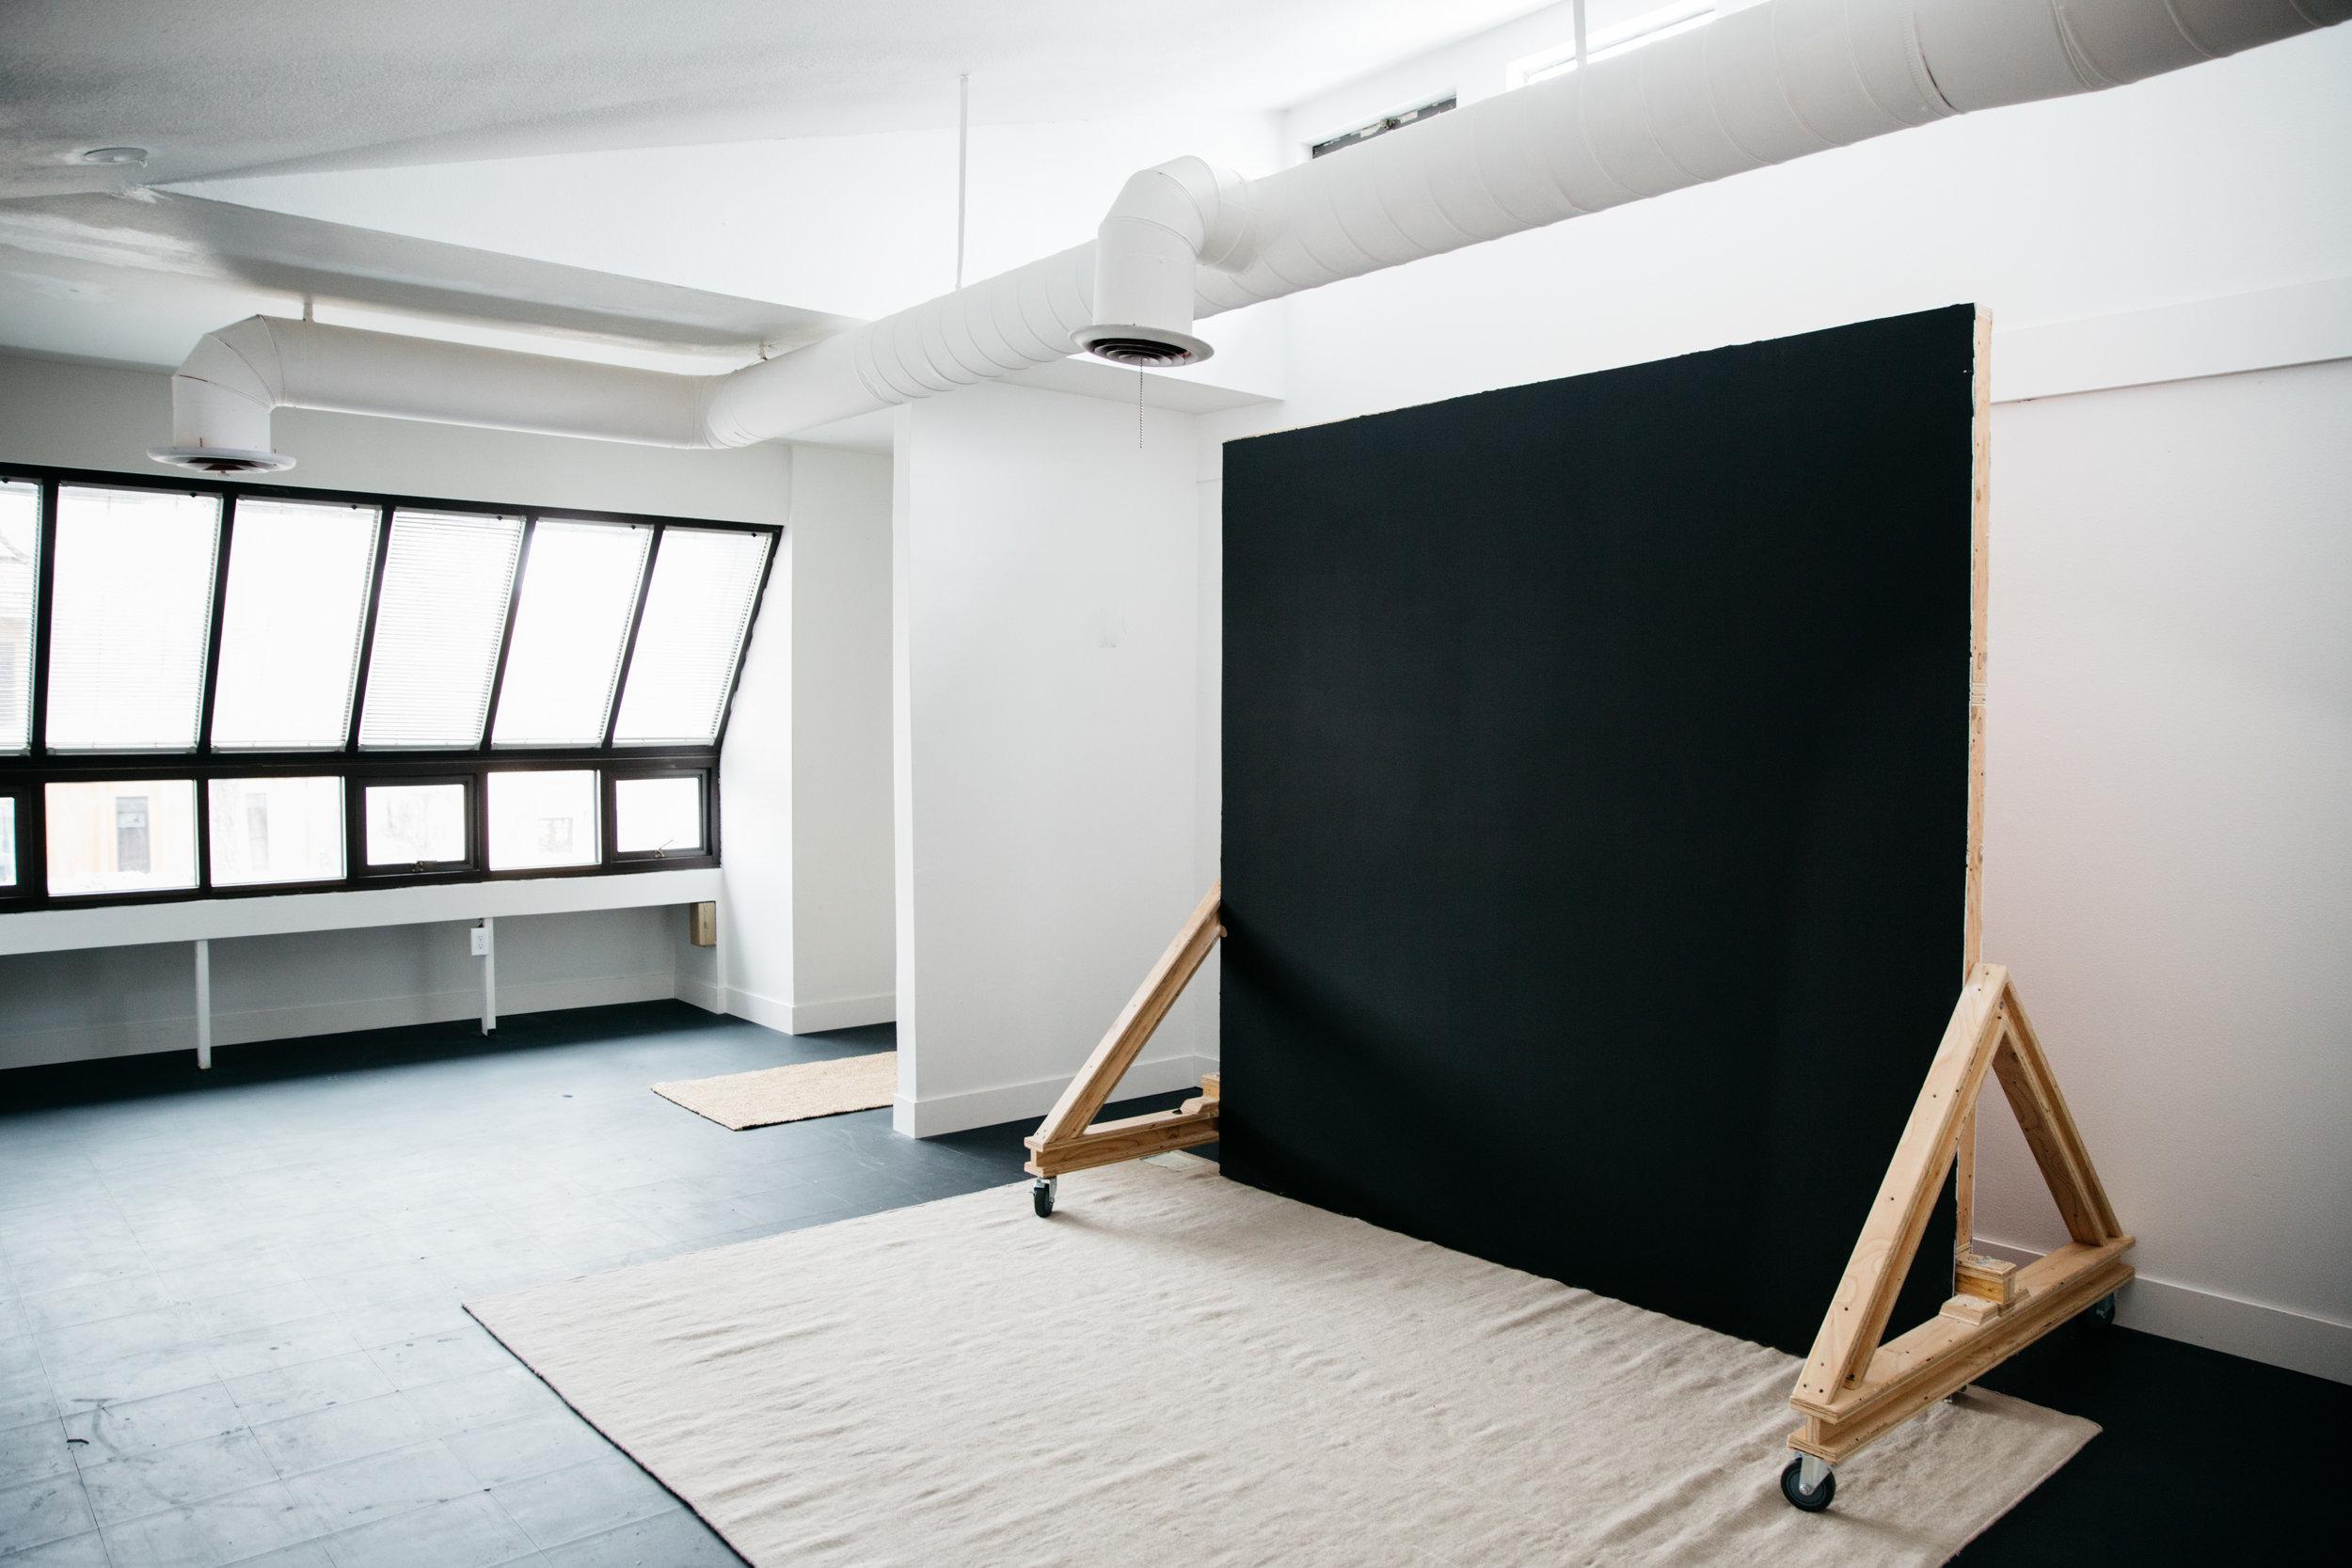 colorado-springs-photography-rental-studio-42.jpg